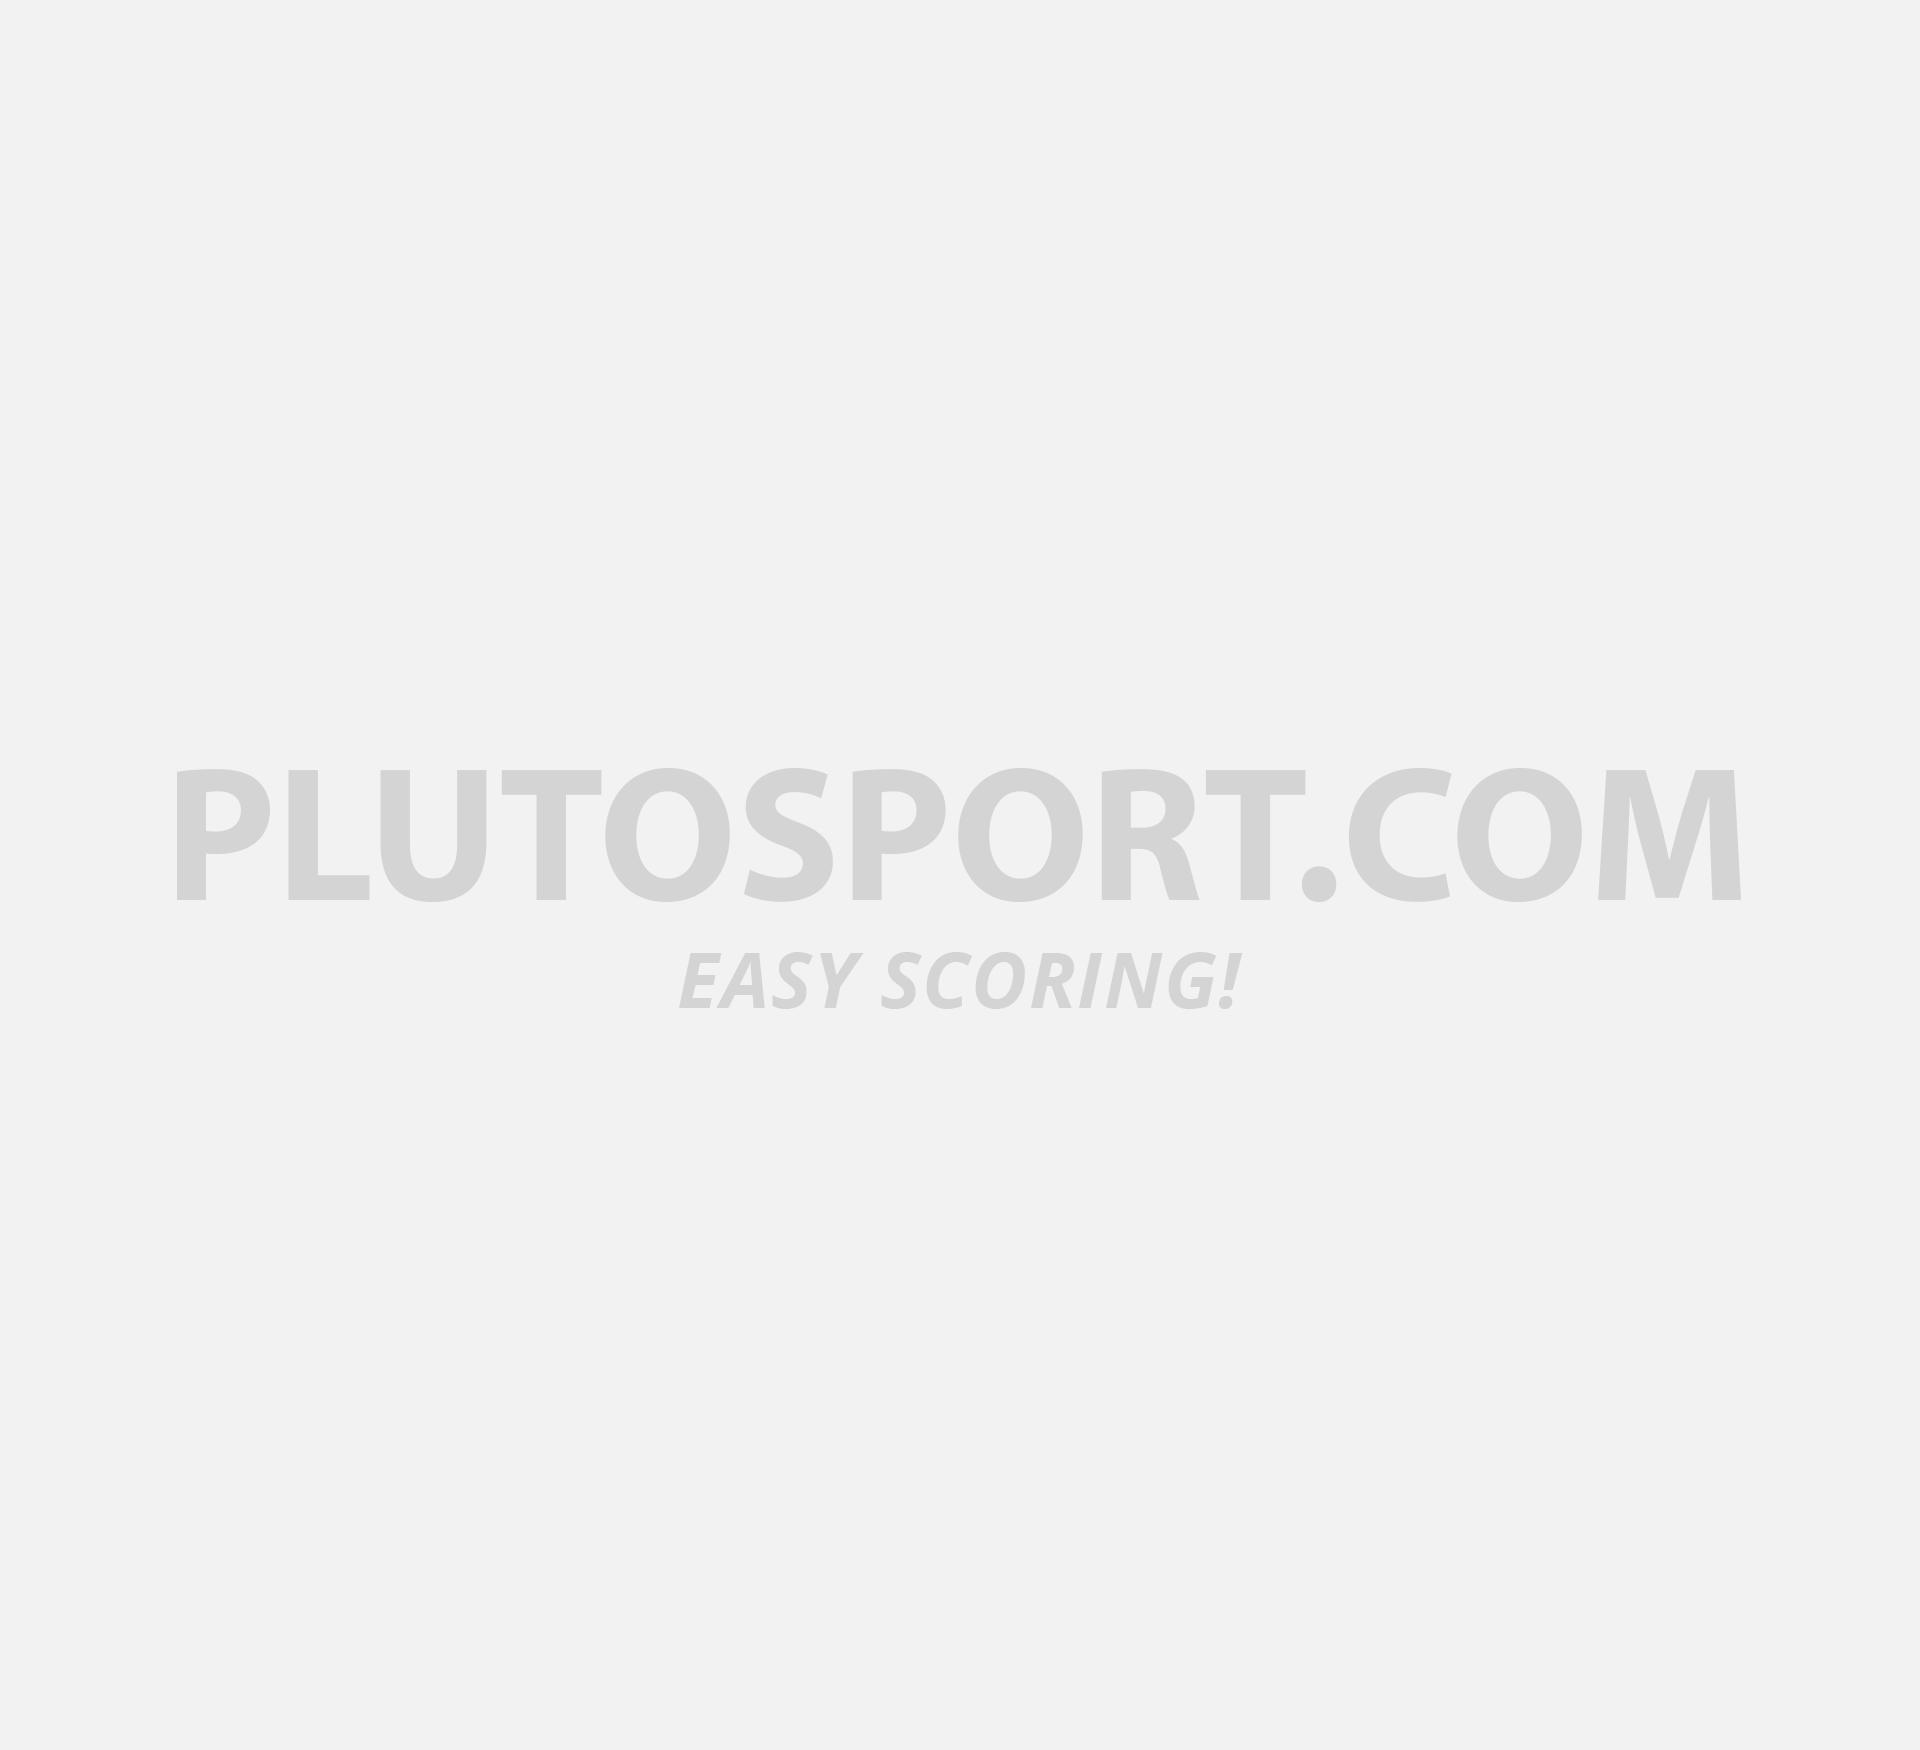 44c440456446 Puma Red Bull Racing Sweatpants - Sweat - Pants - Clothing - Lifestyle -  Sports